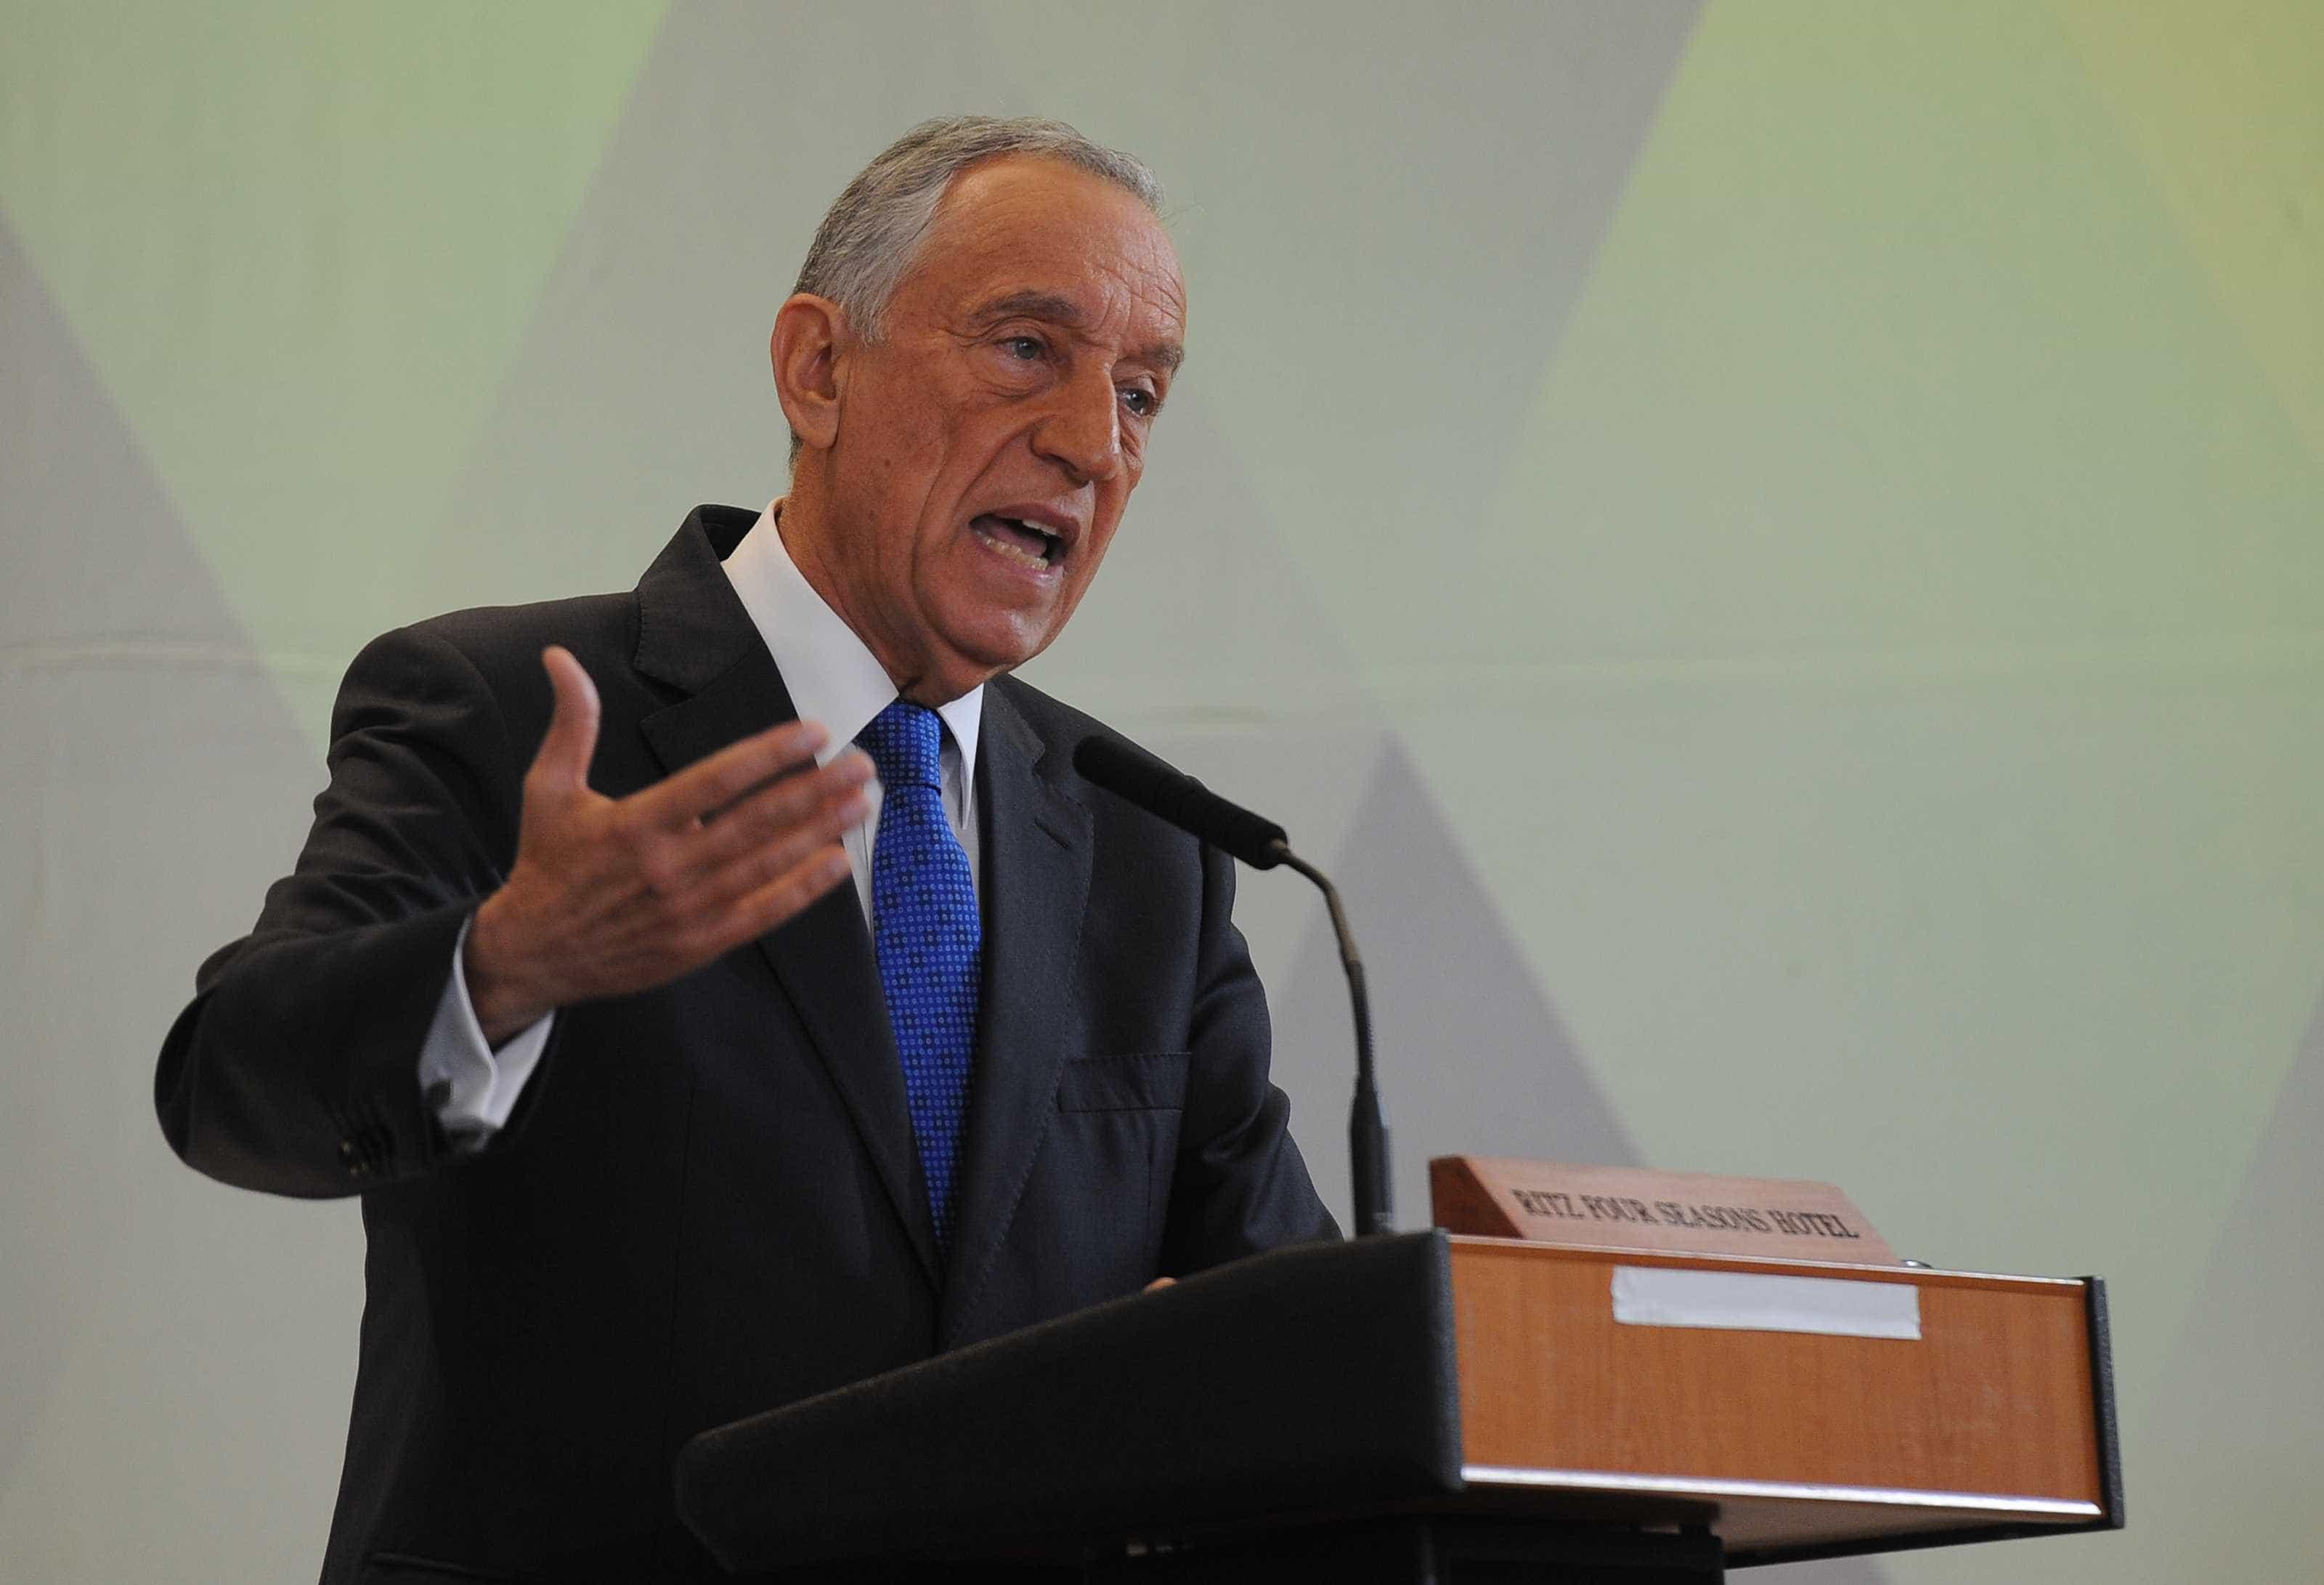 Presidente da República promulga diploma de investimento para o Interior